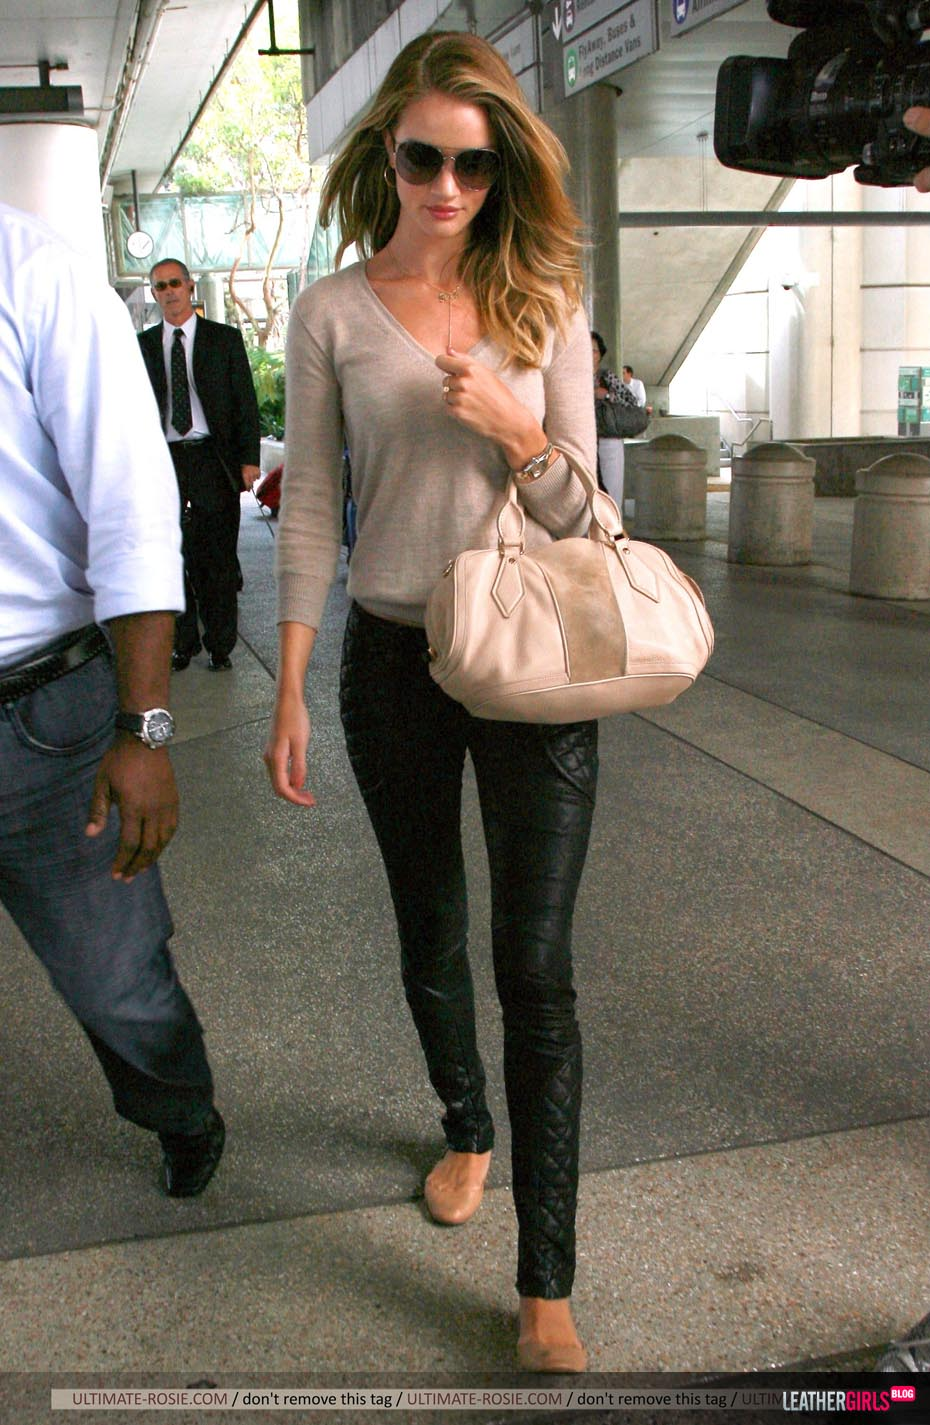 Rosie Huntington-Whiteley was spotted arriving back in LA leathergirlsblog-com- (3).jpg